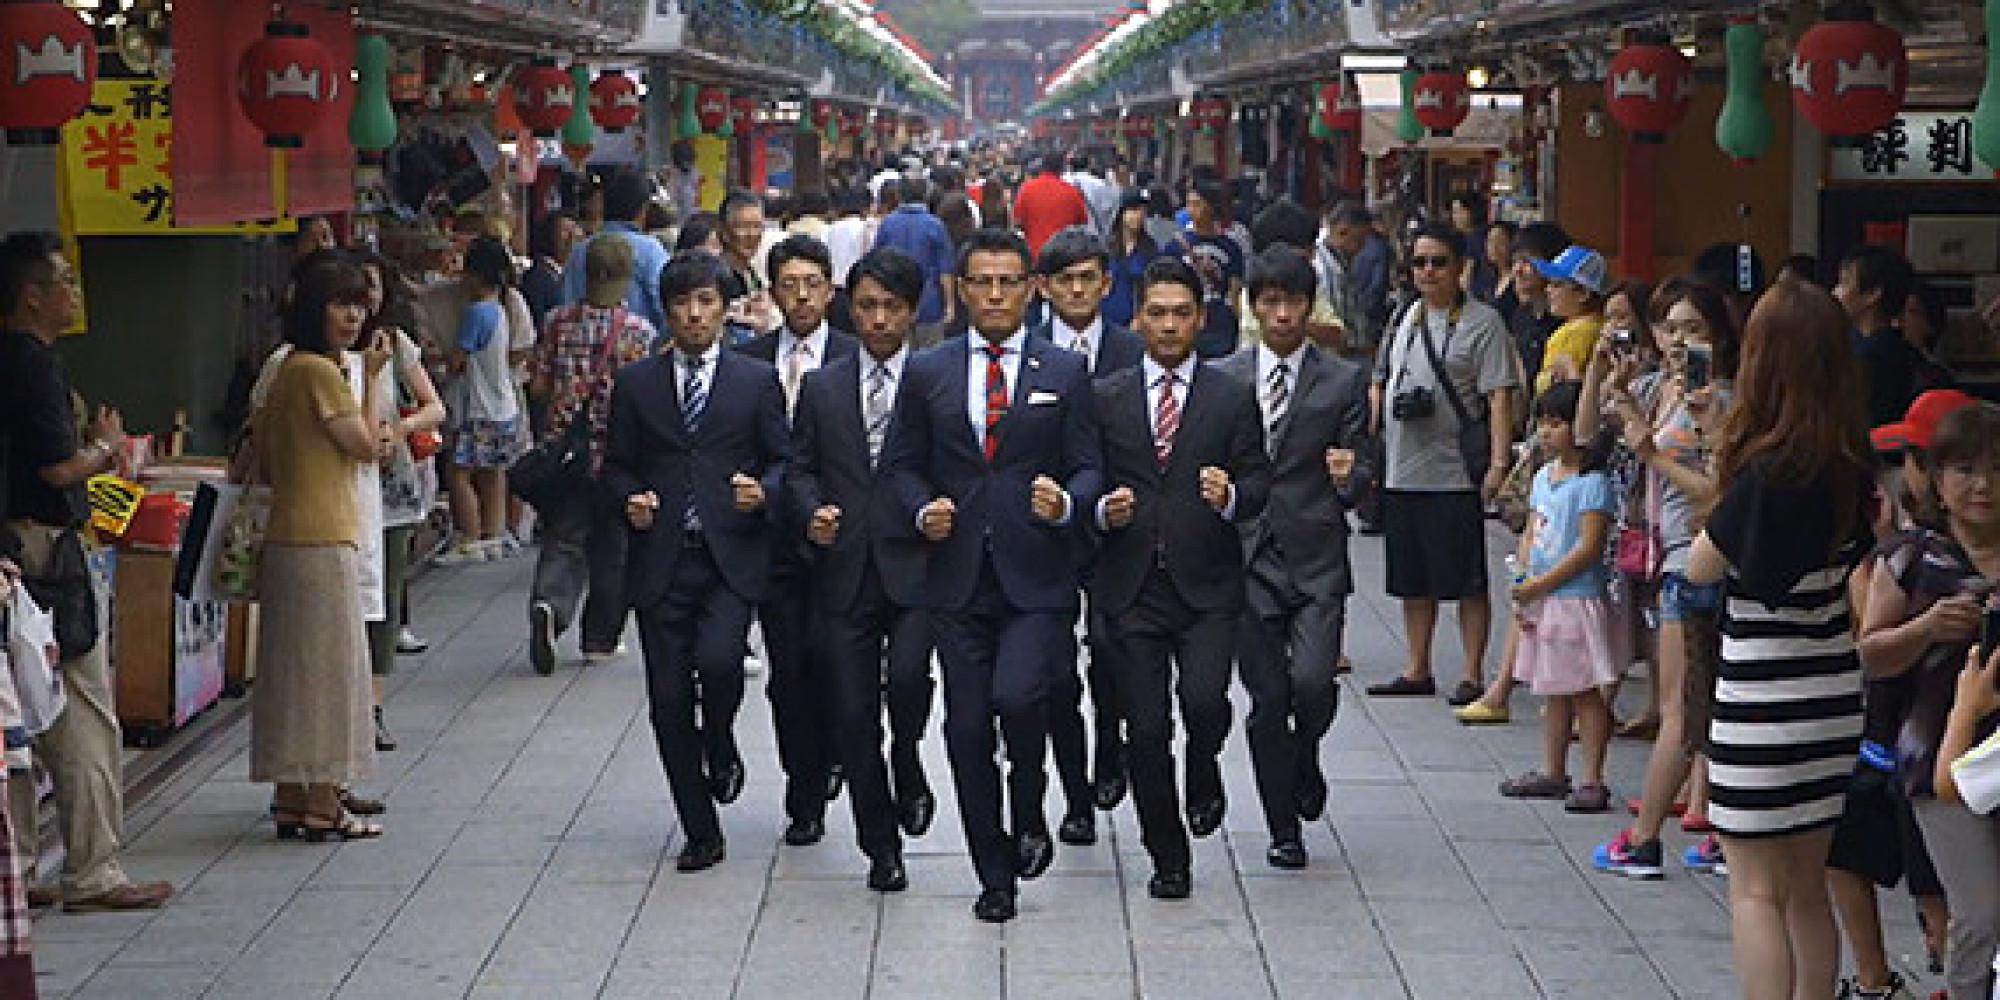 World Order (band)